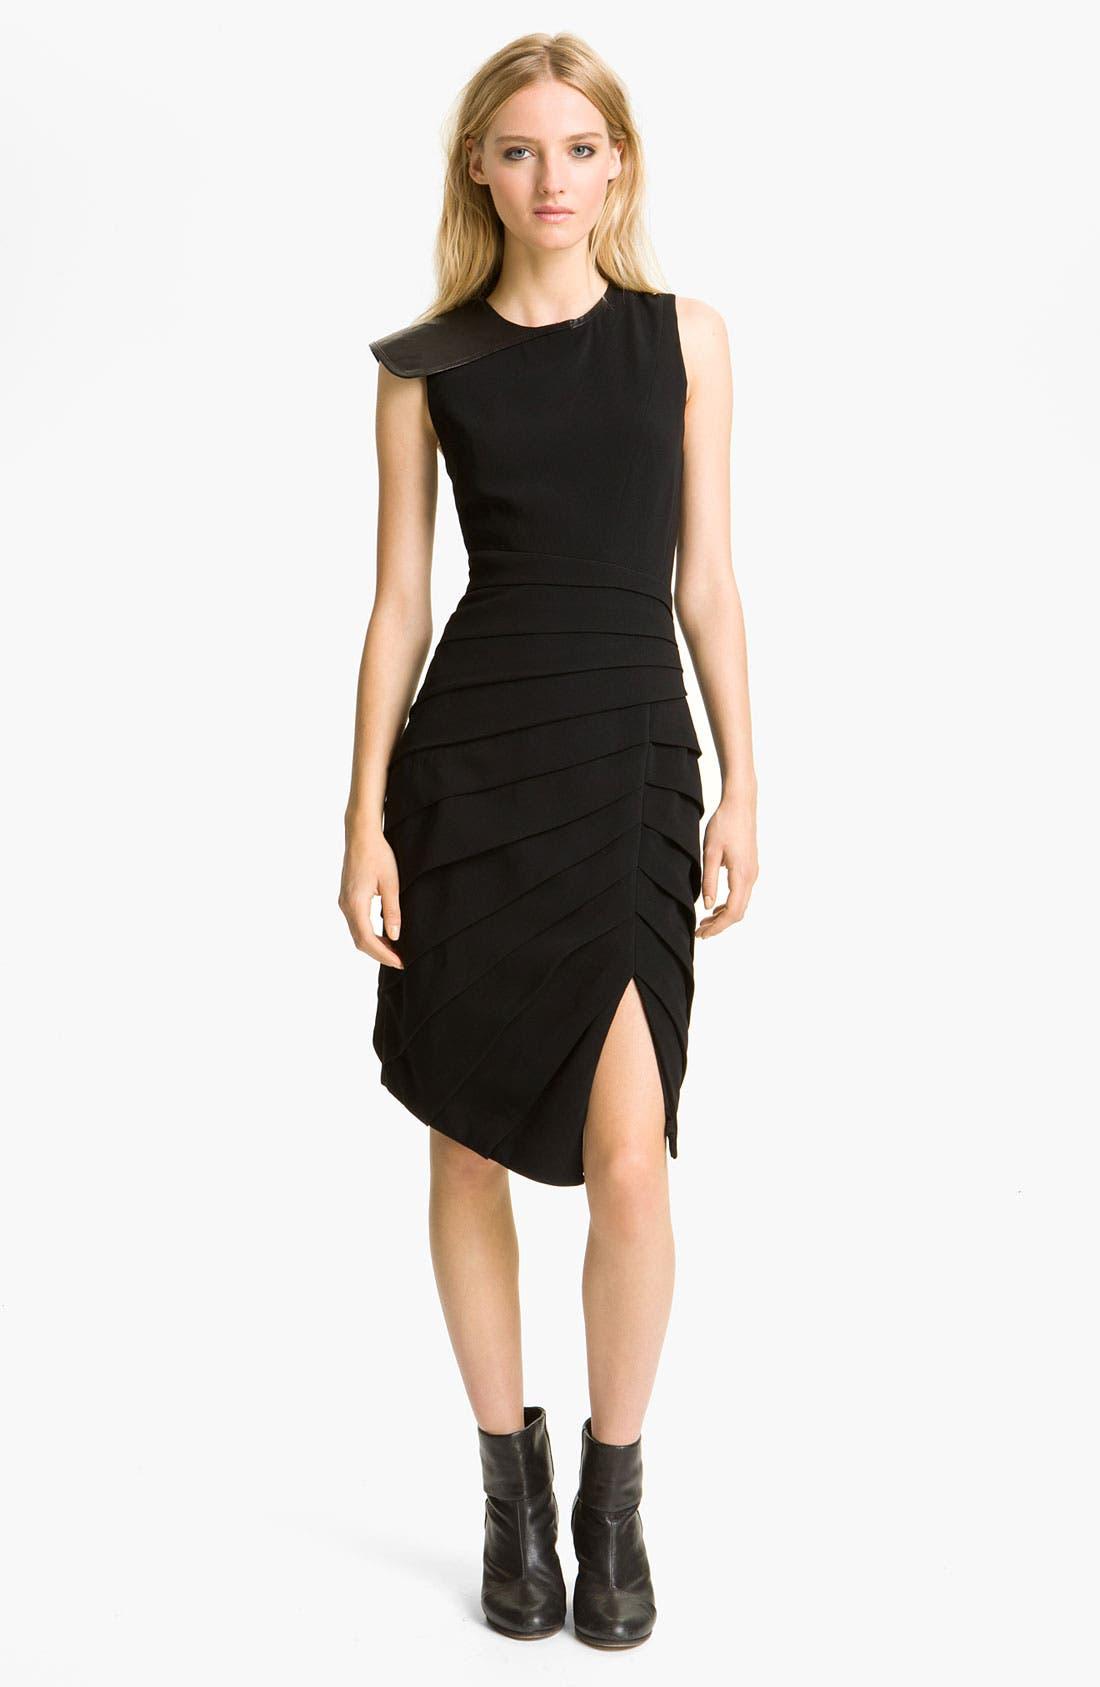 Main Image - rag & bone 'Origami' Leather Trim Dress